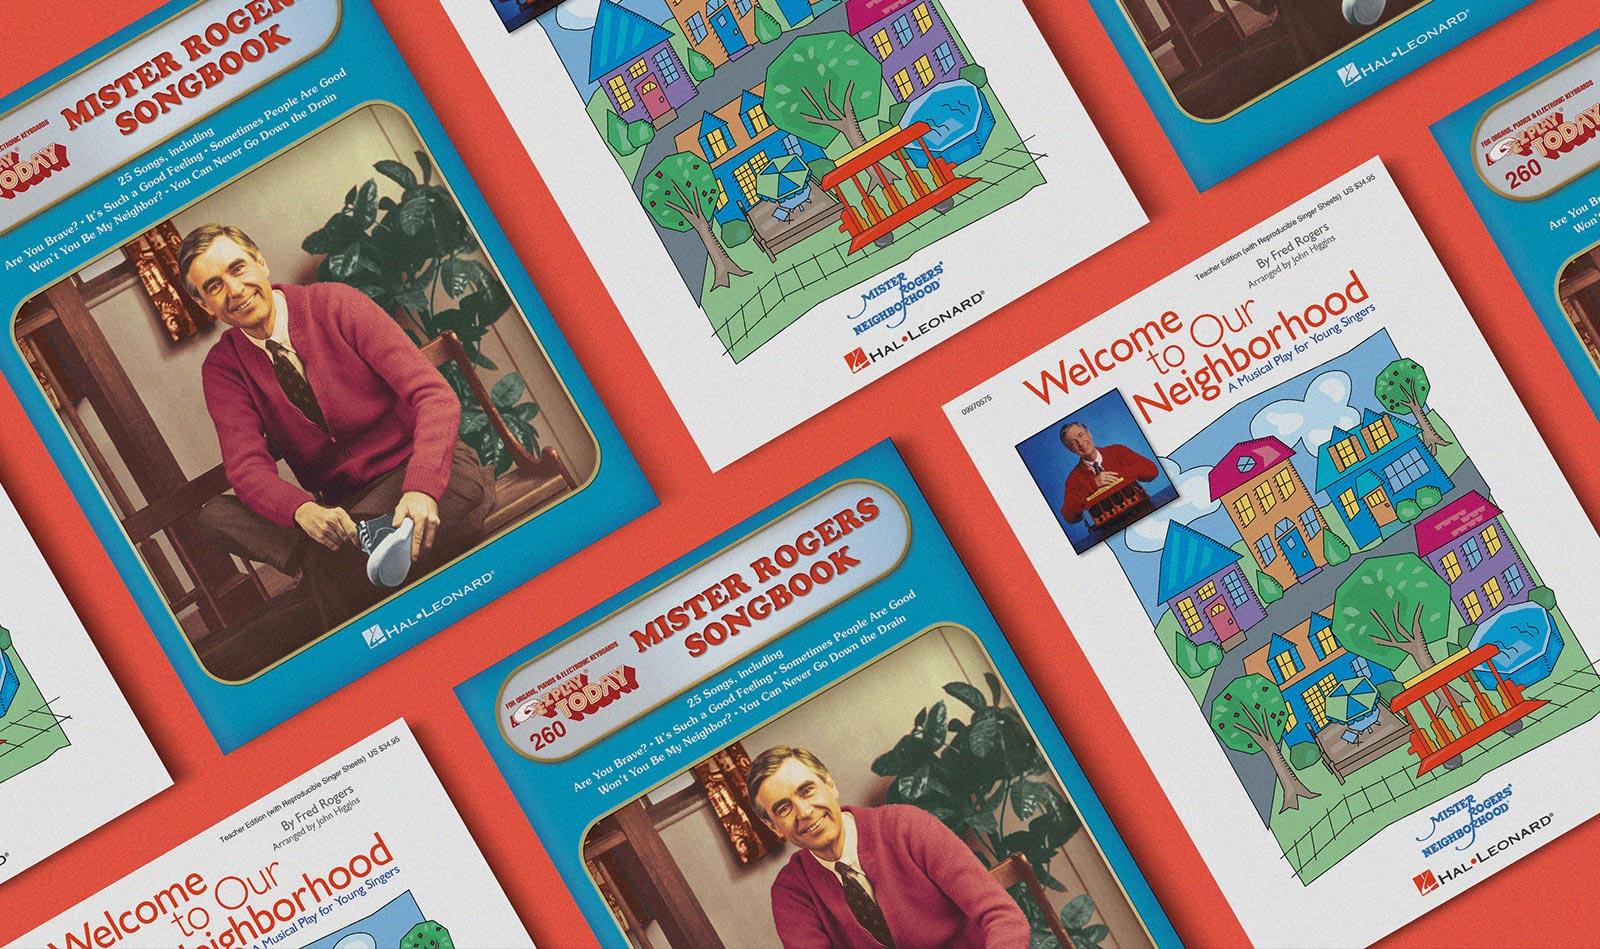 How Mister Rogers Neighborhood Impacted Music Education Cued In